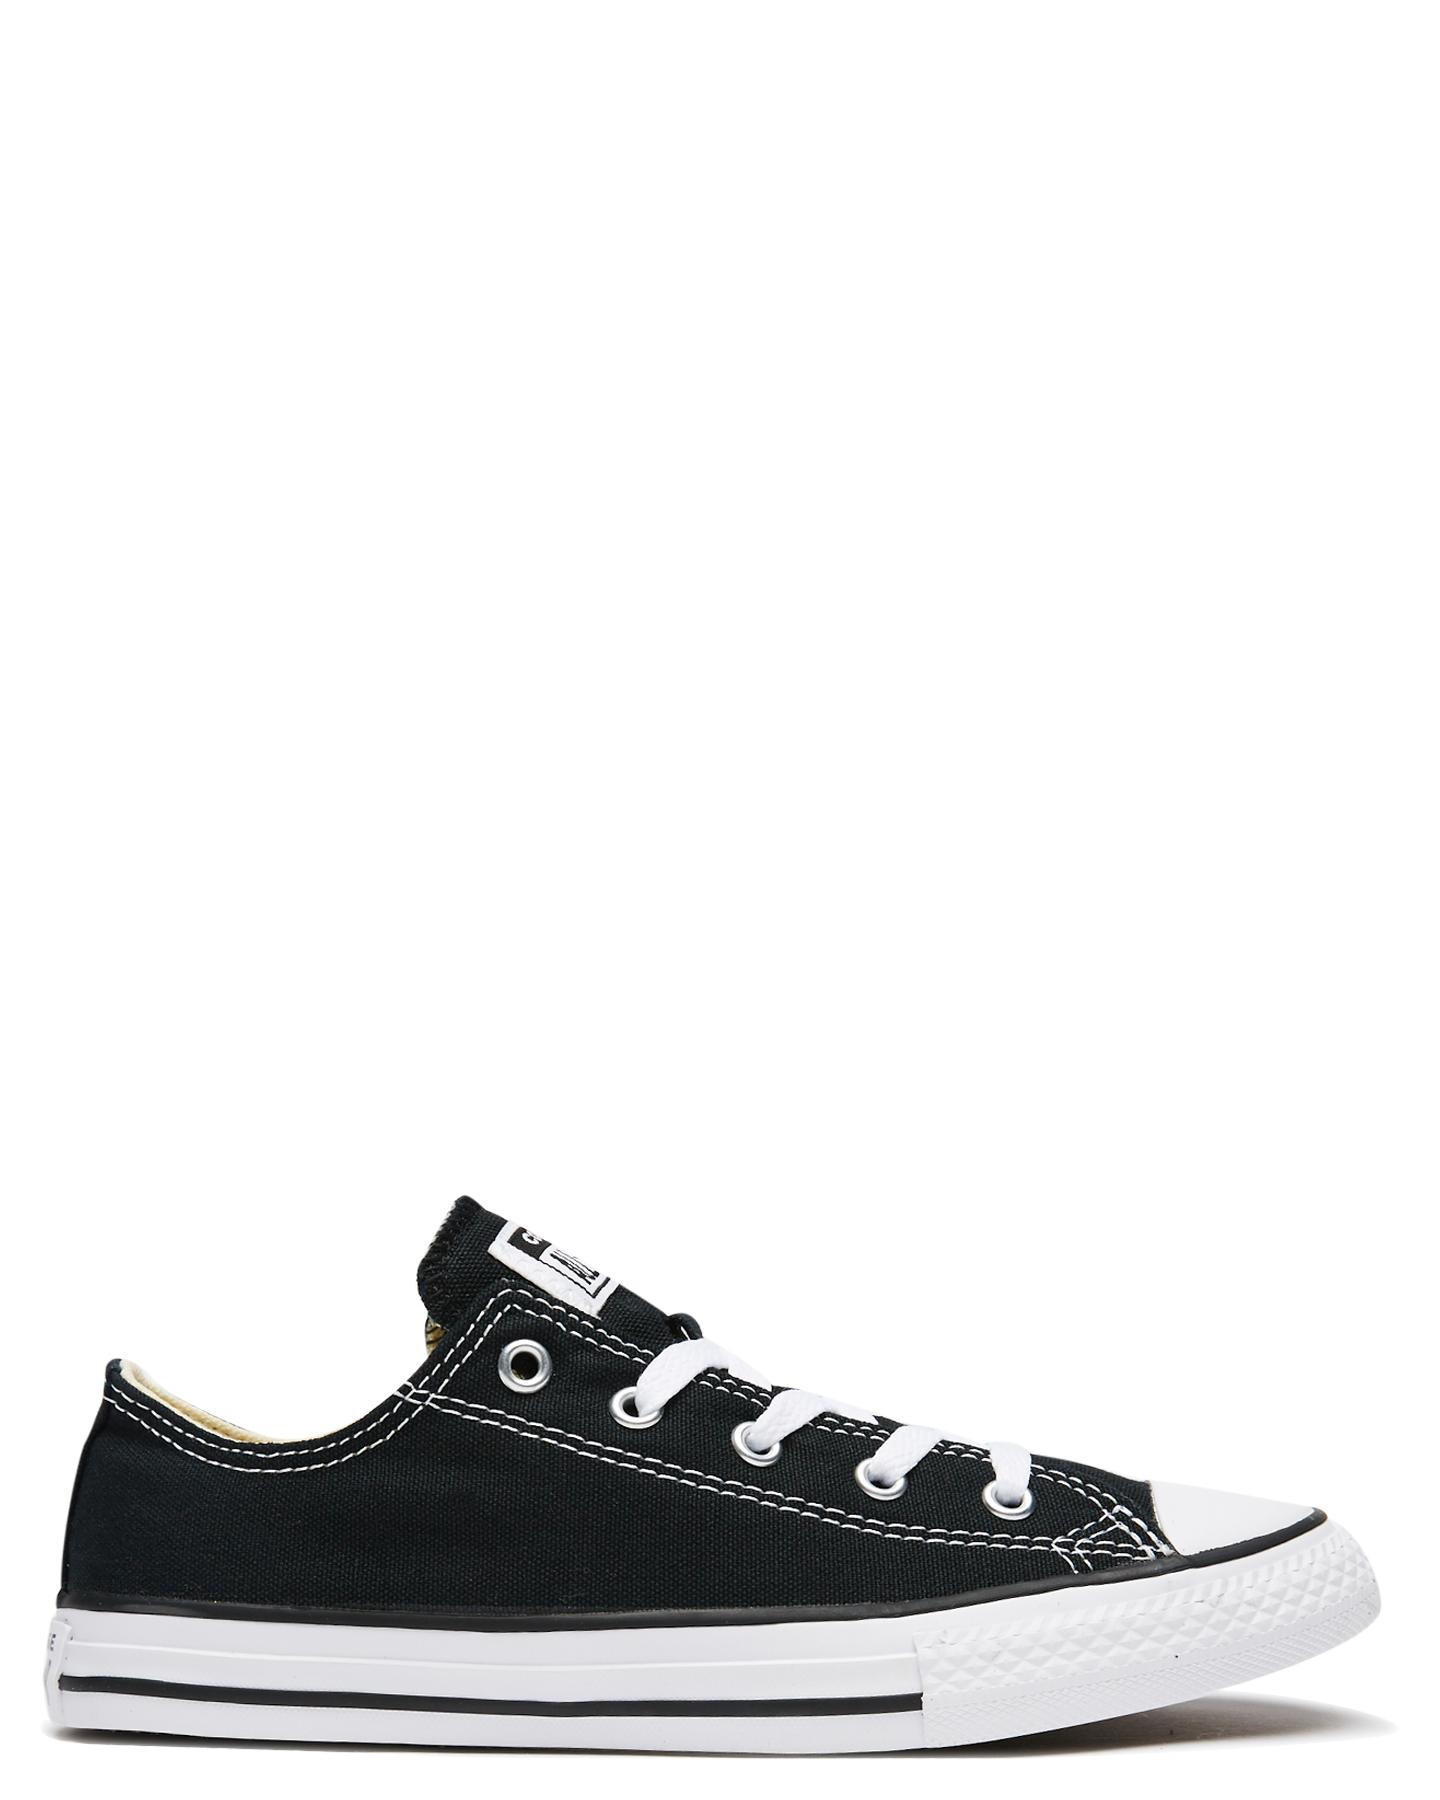 cdfe001e0b9f Converse Kids Chuck Taylor All Star Lo Shoe Black Baby Boys Shoes ...